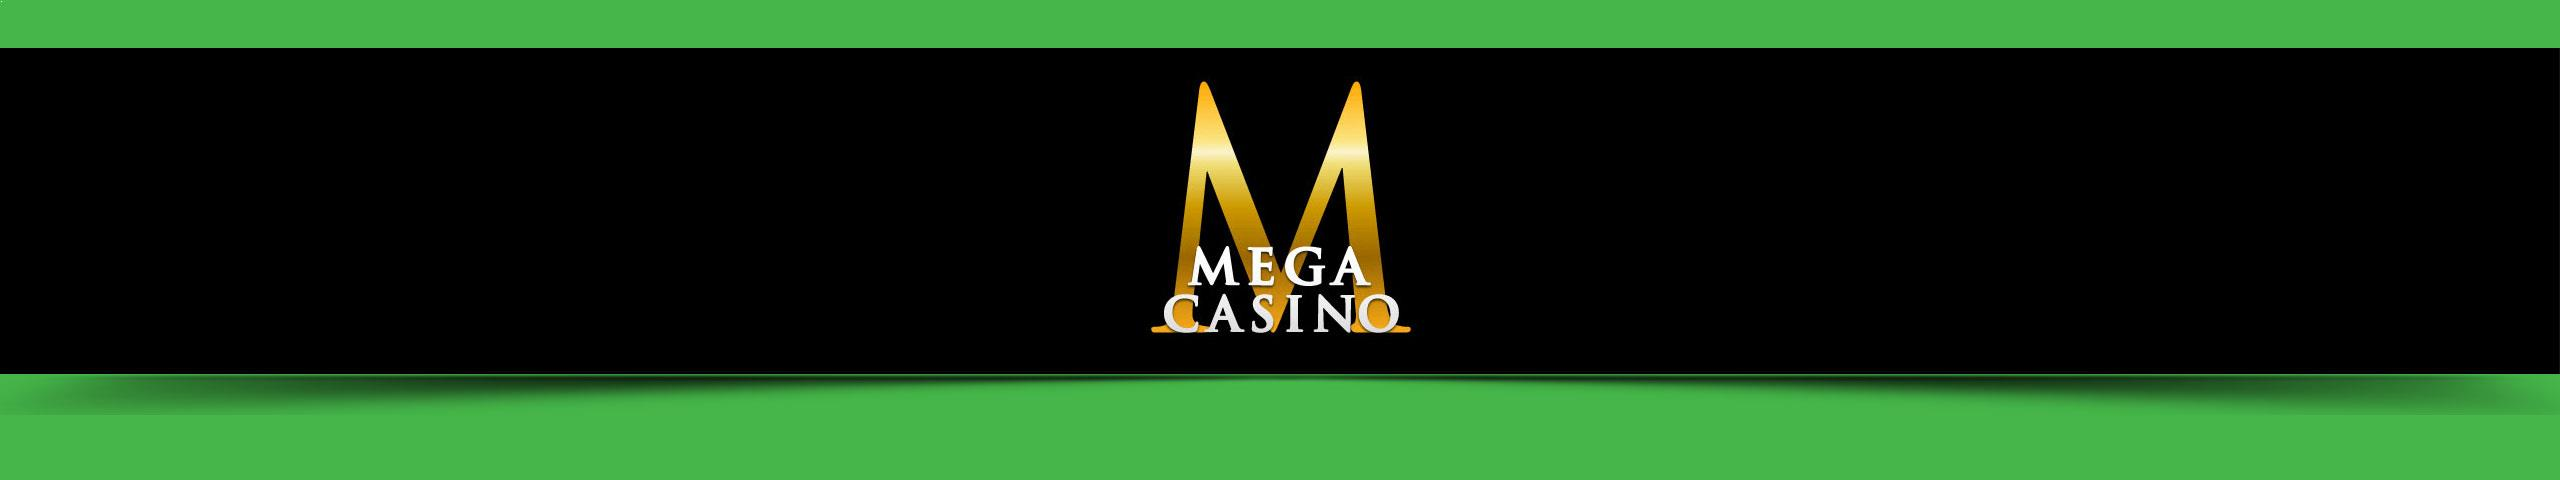 MegaCasino Vizualizarea Casino-ului Casino Multa Bafta Slider